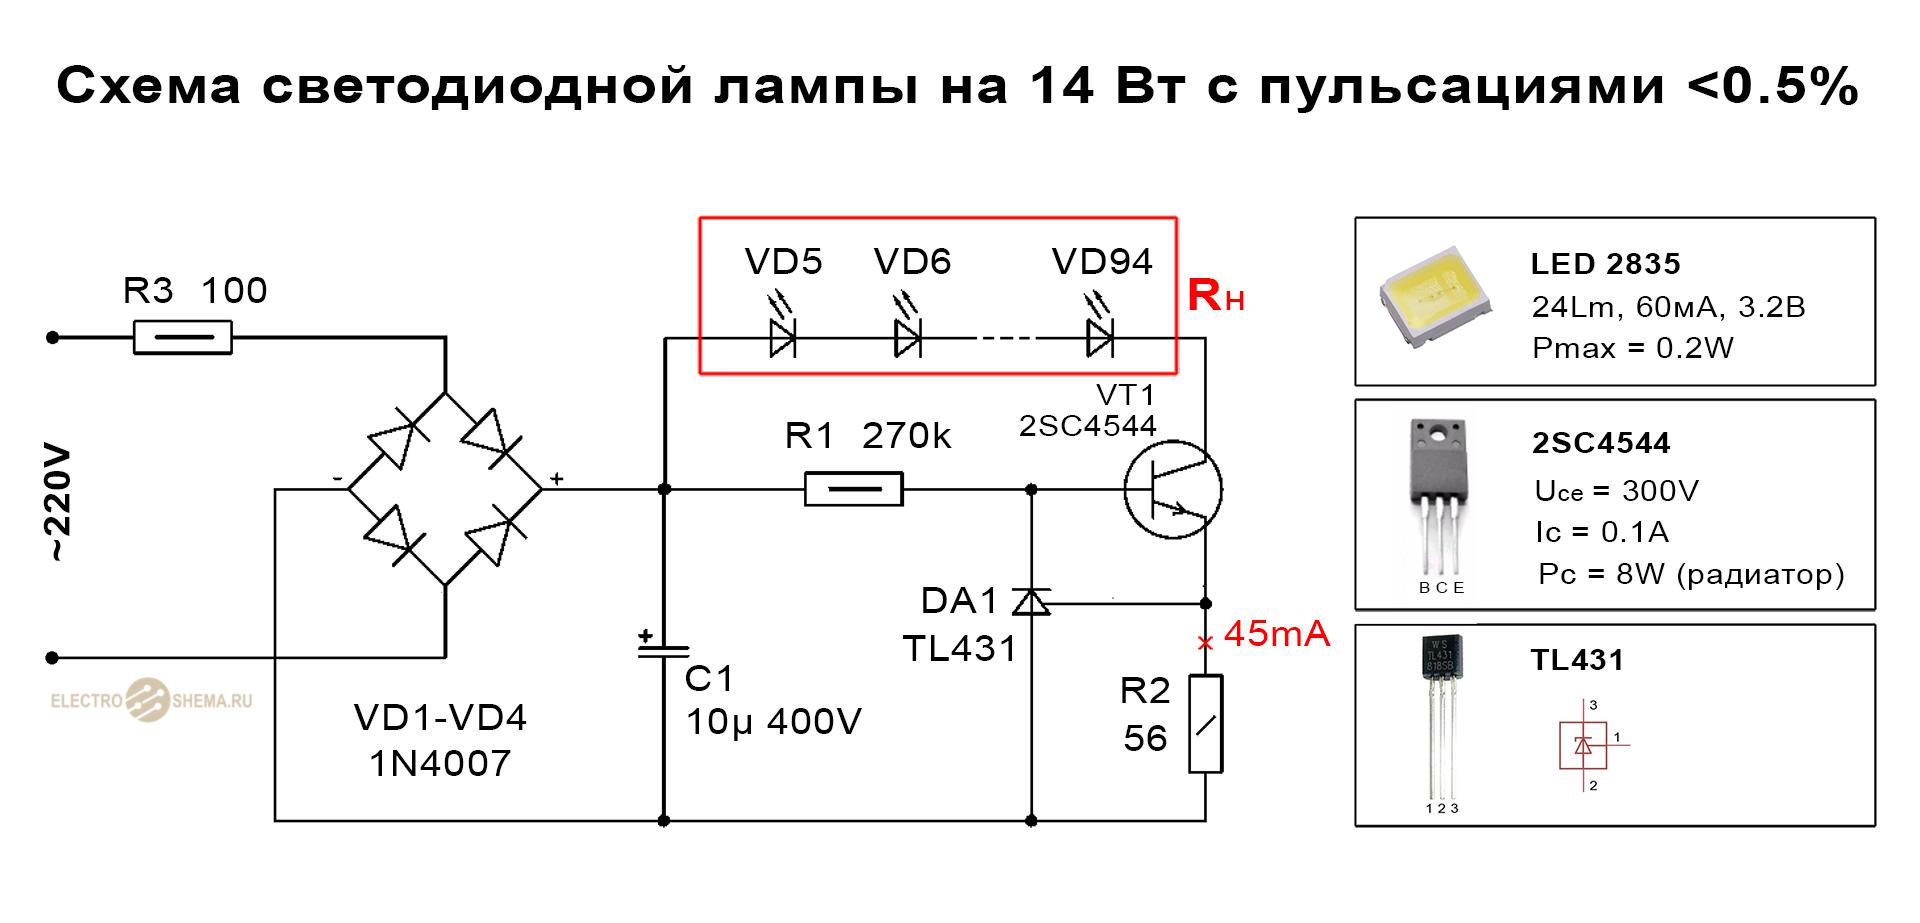 Схема светильника без пульсаций (LED-лампа на TL431)